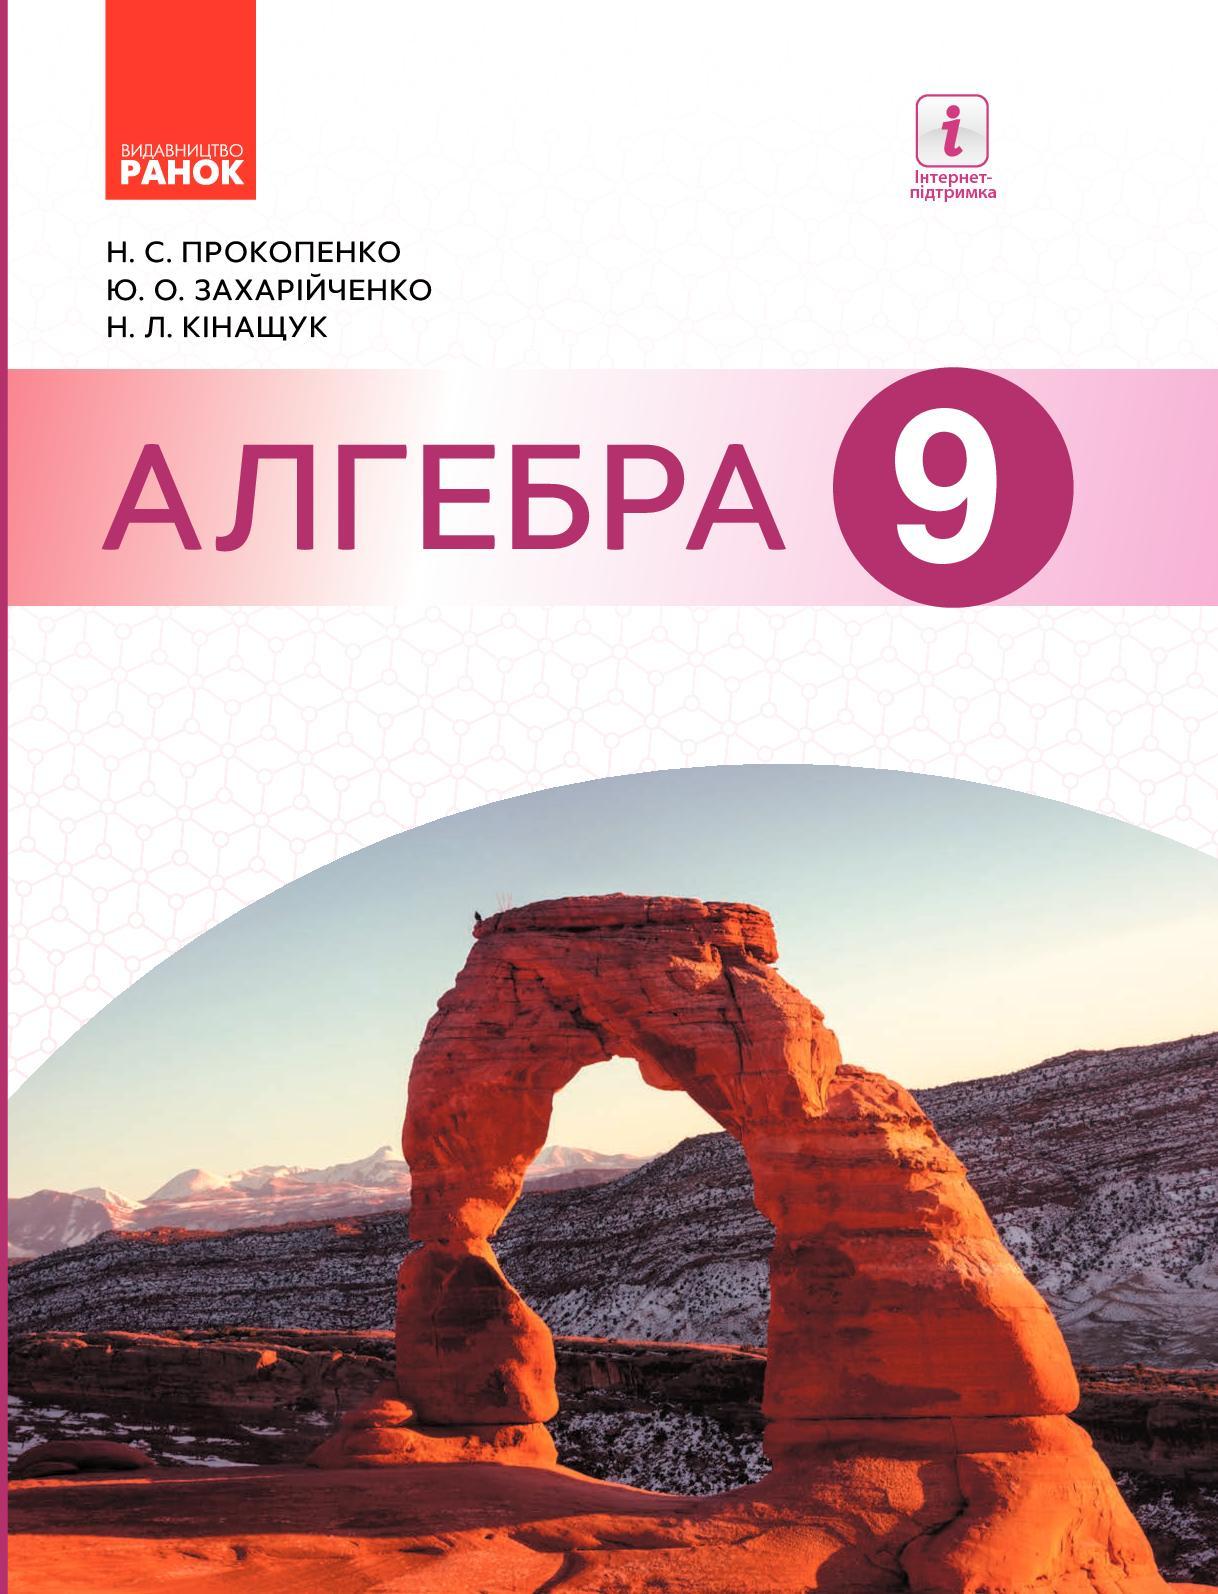 Calaméo - 9 Klas Algebra Prokopenko 2017 a5c850cb735c4